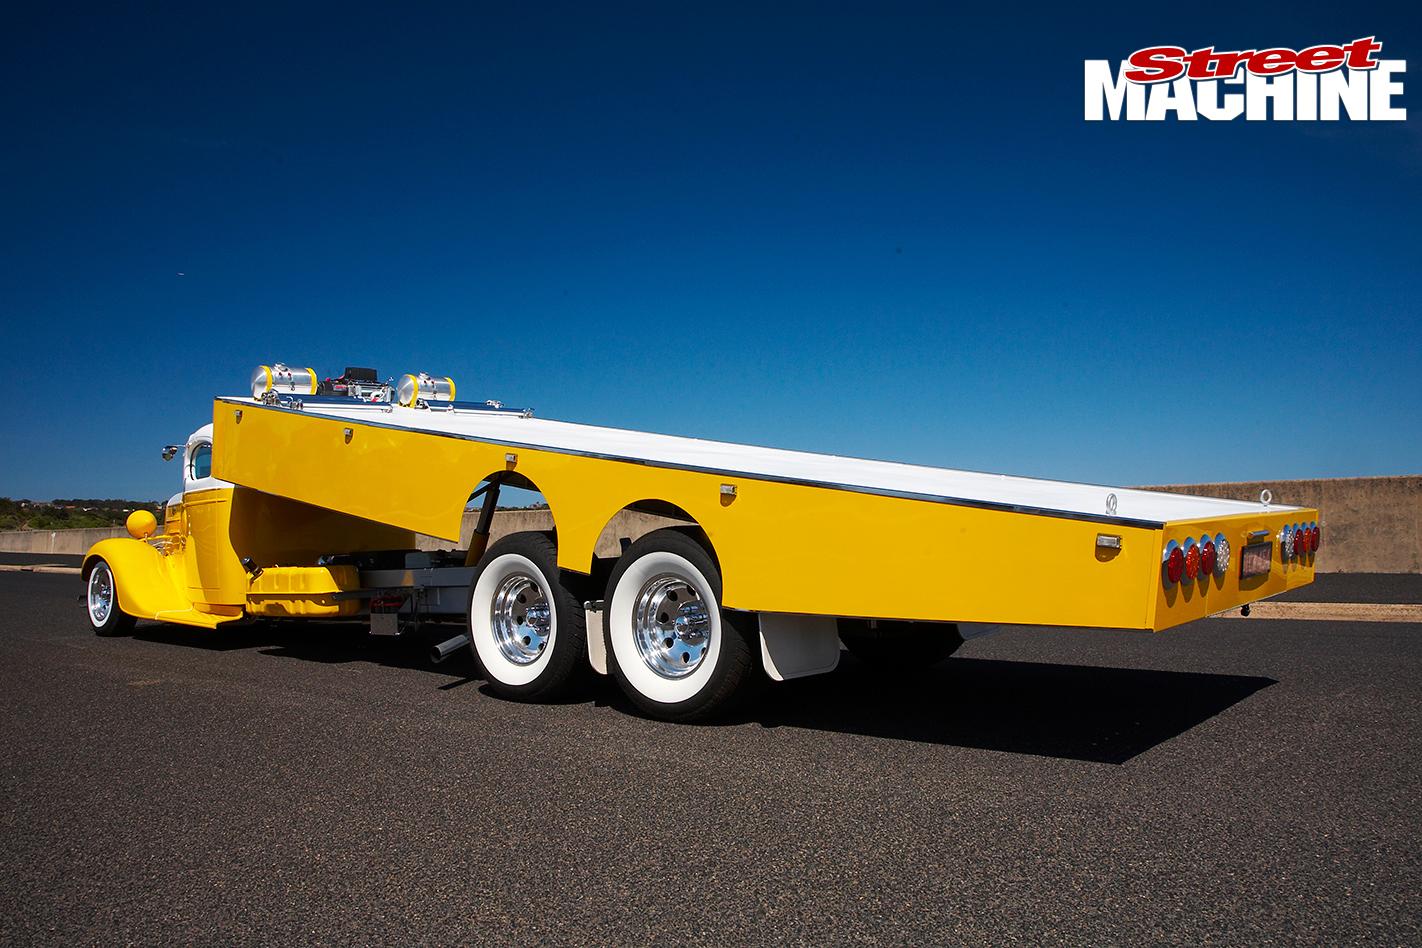 Chev -tow -truck -tilt -tray